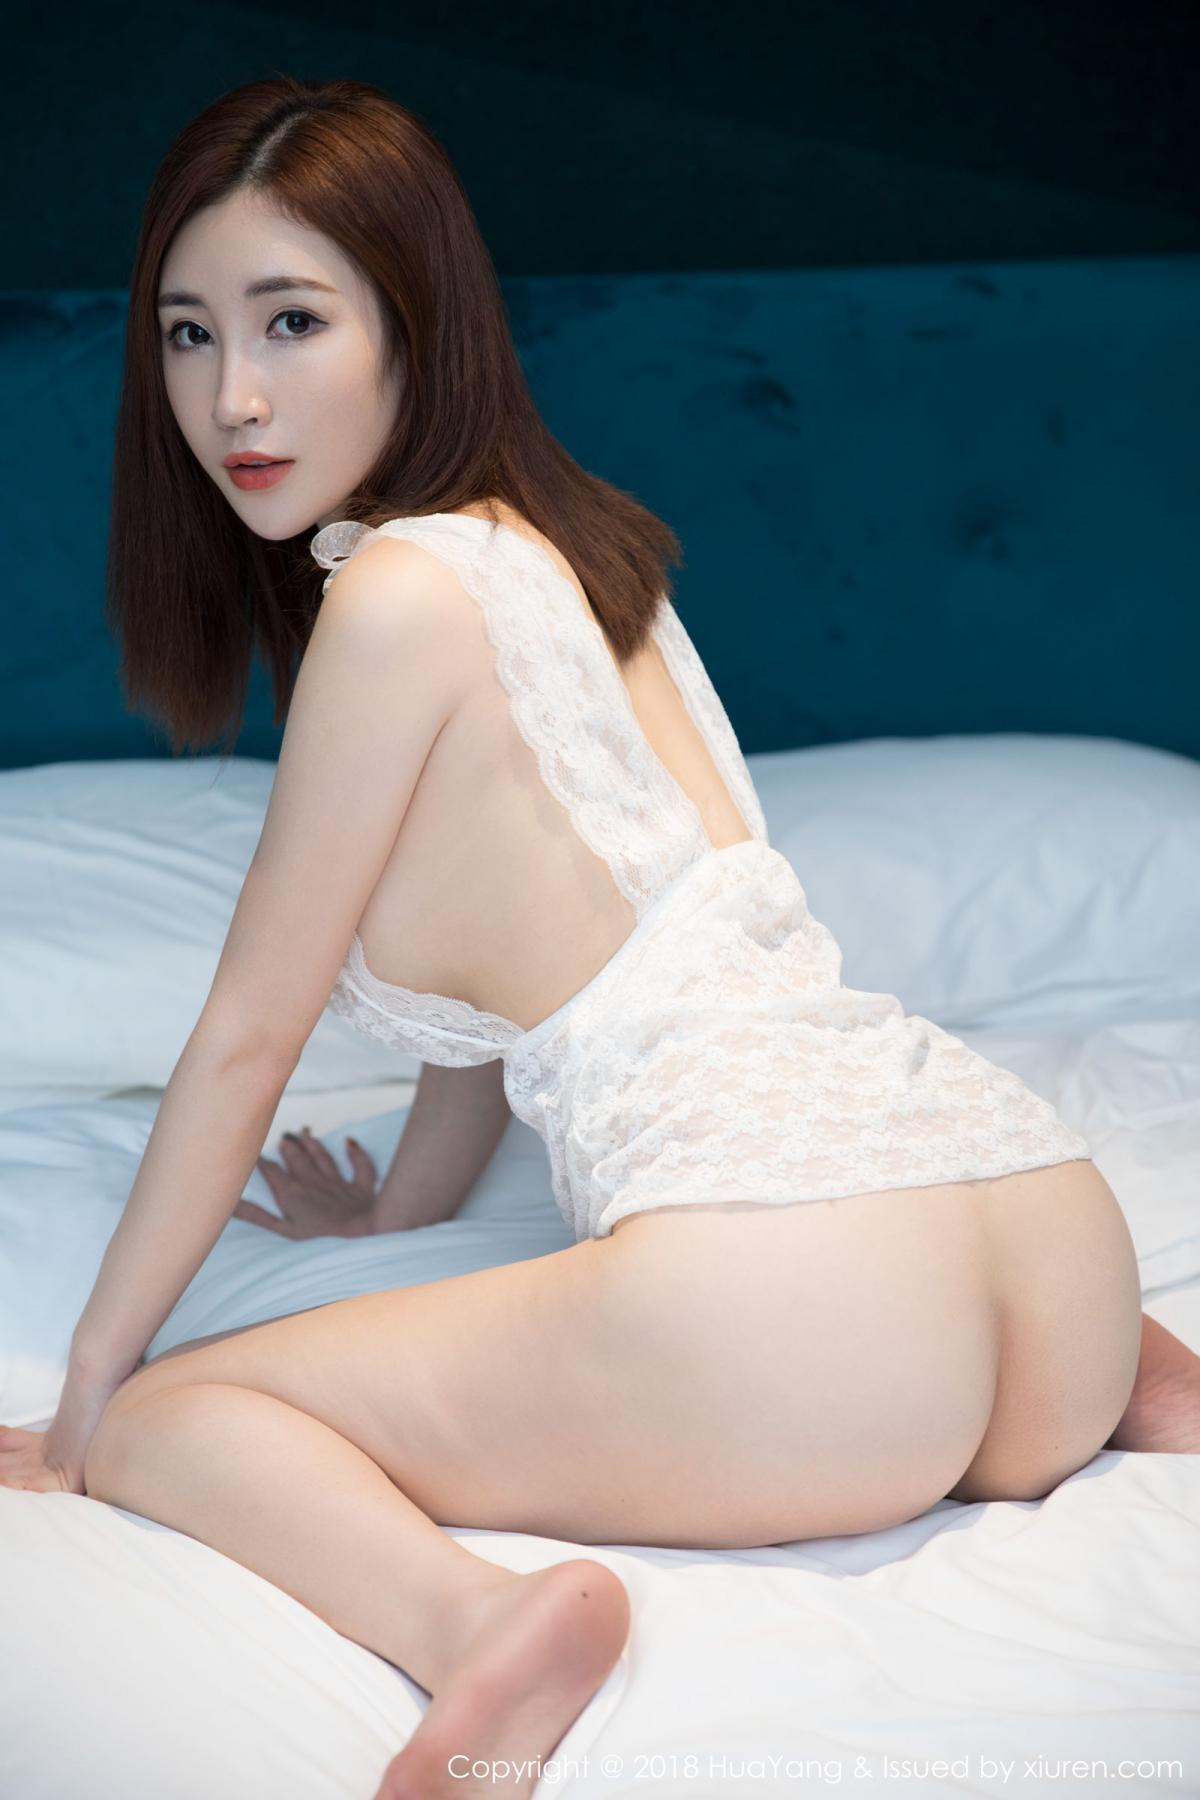 [Huayang] Vol.077 Sun Meng Yao 26P, Adult, Big Booty, HuaYang, Sun Meng Yao, Underwear